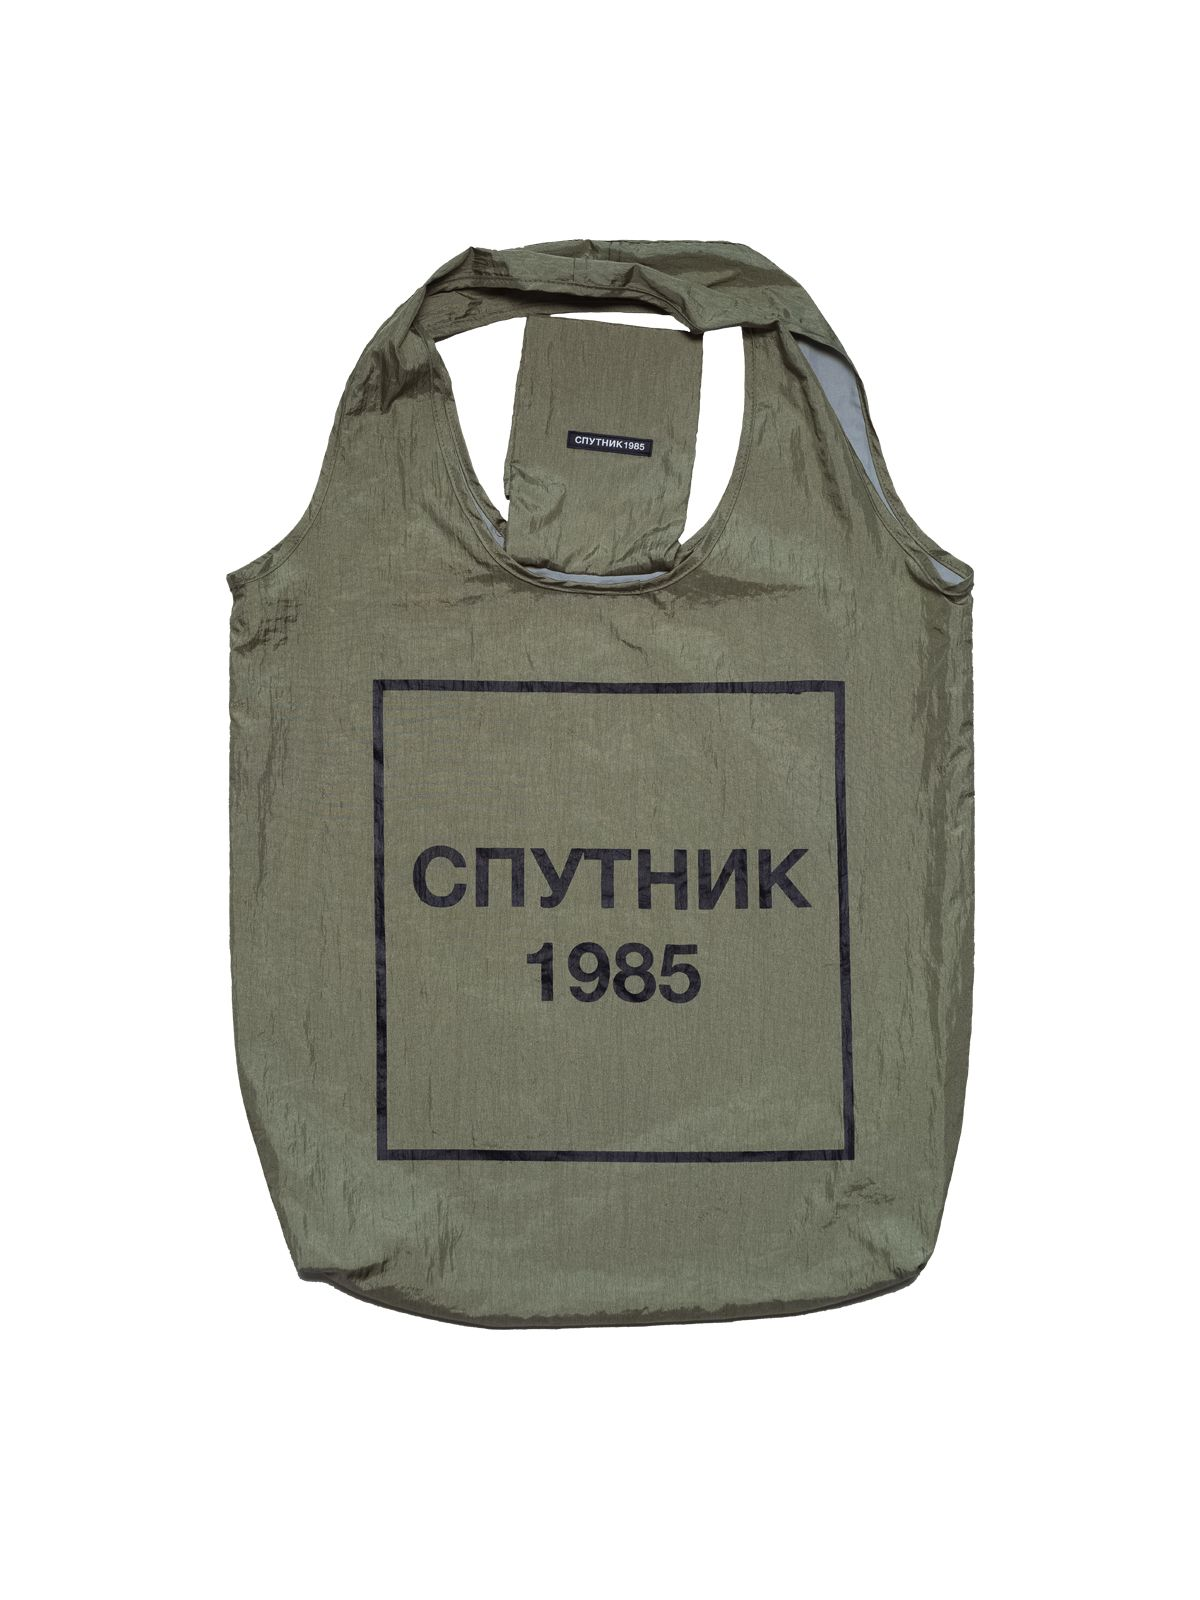 Сумка СПУТНИК1985 хаки AV1